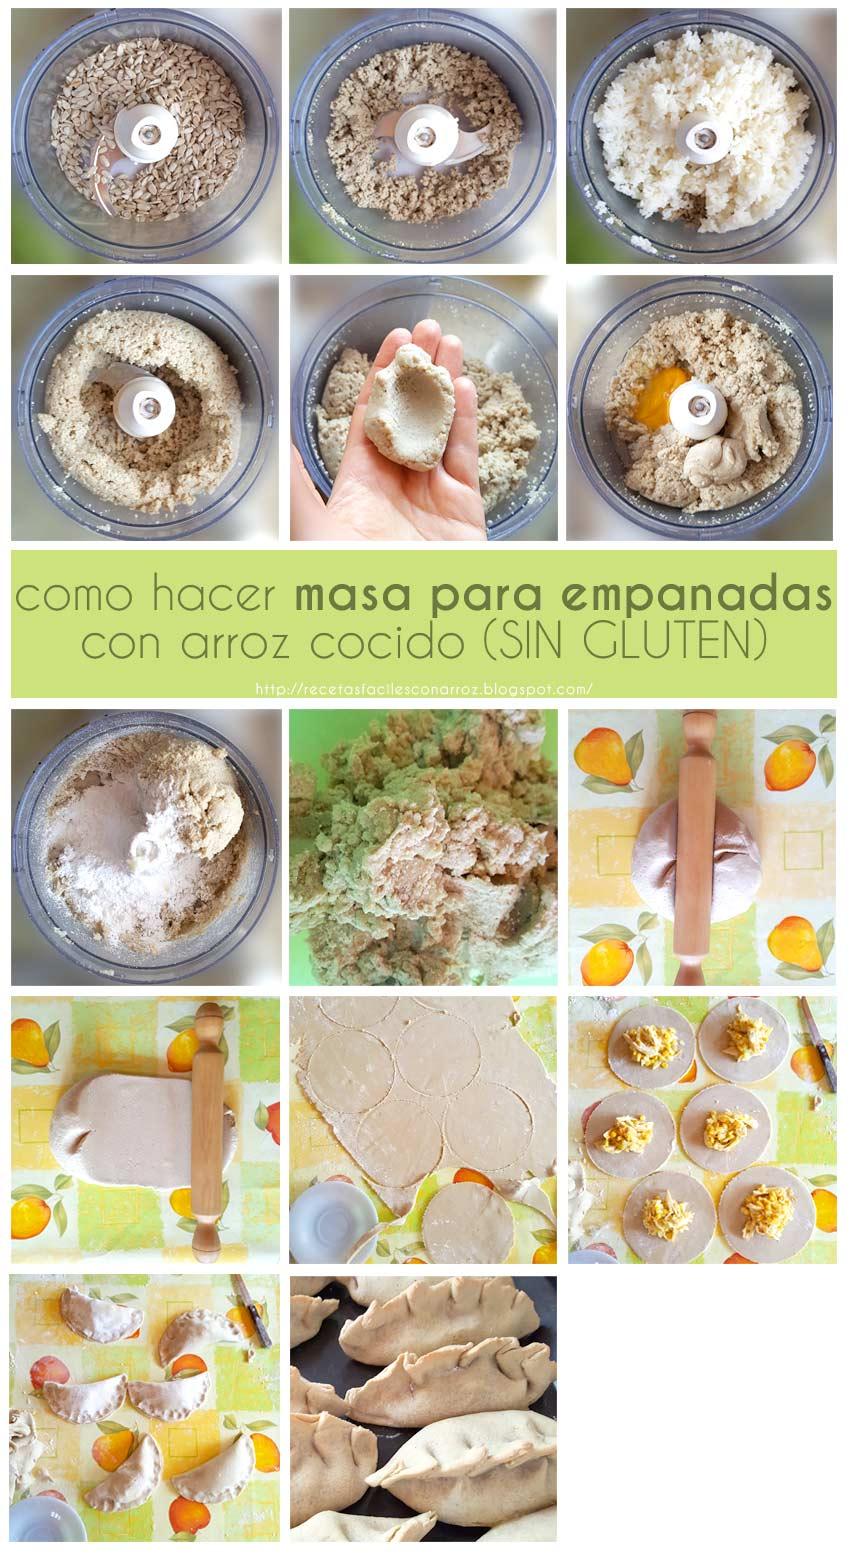 empanadas sin gluten fototutorial